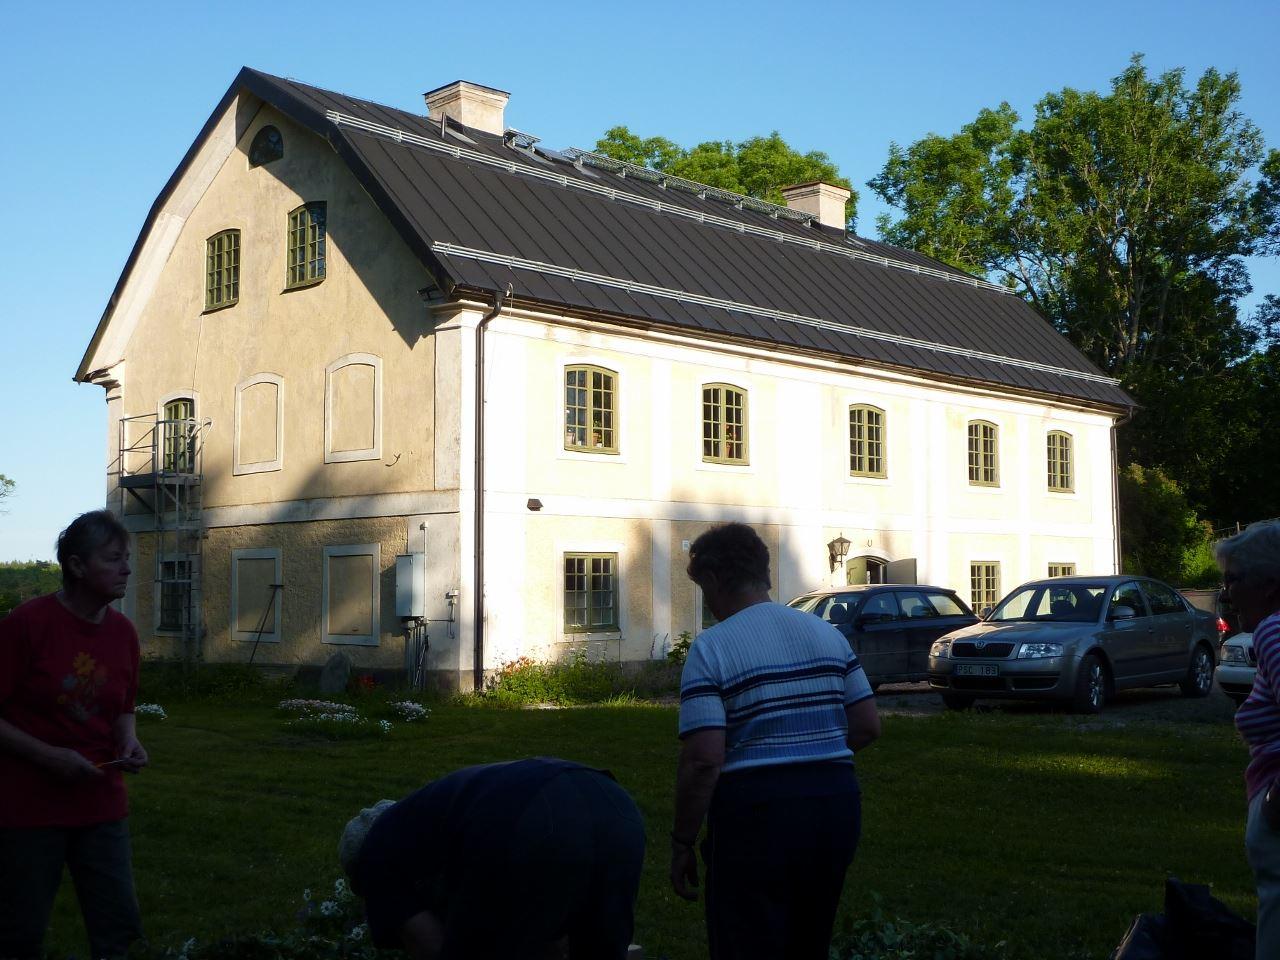 Gammel-Gränome, STF Gästehaus